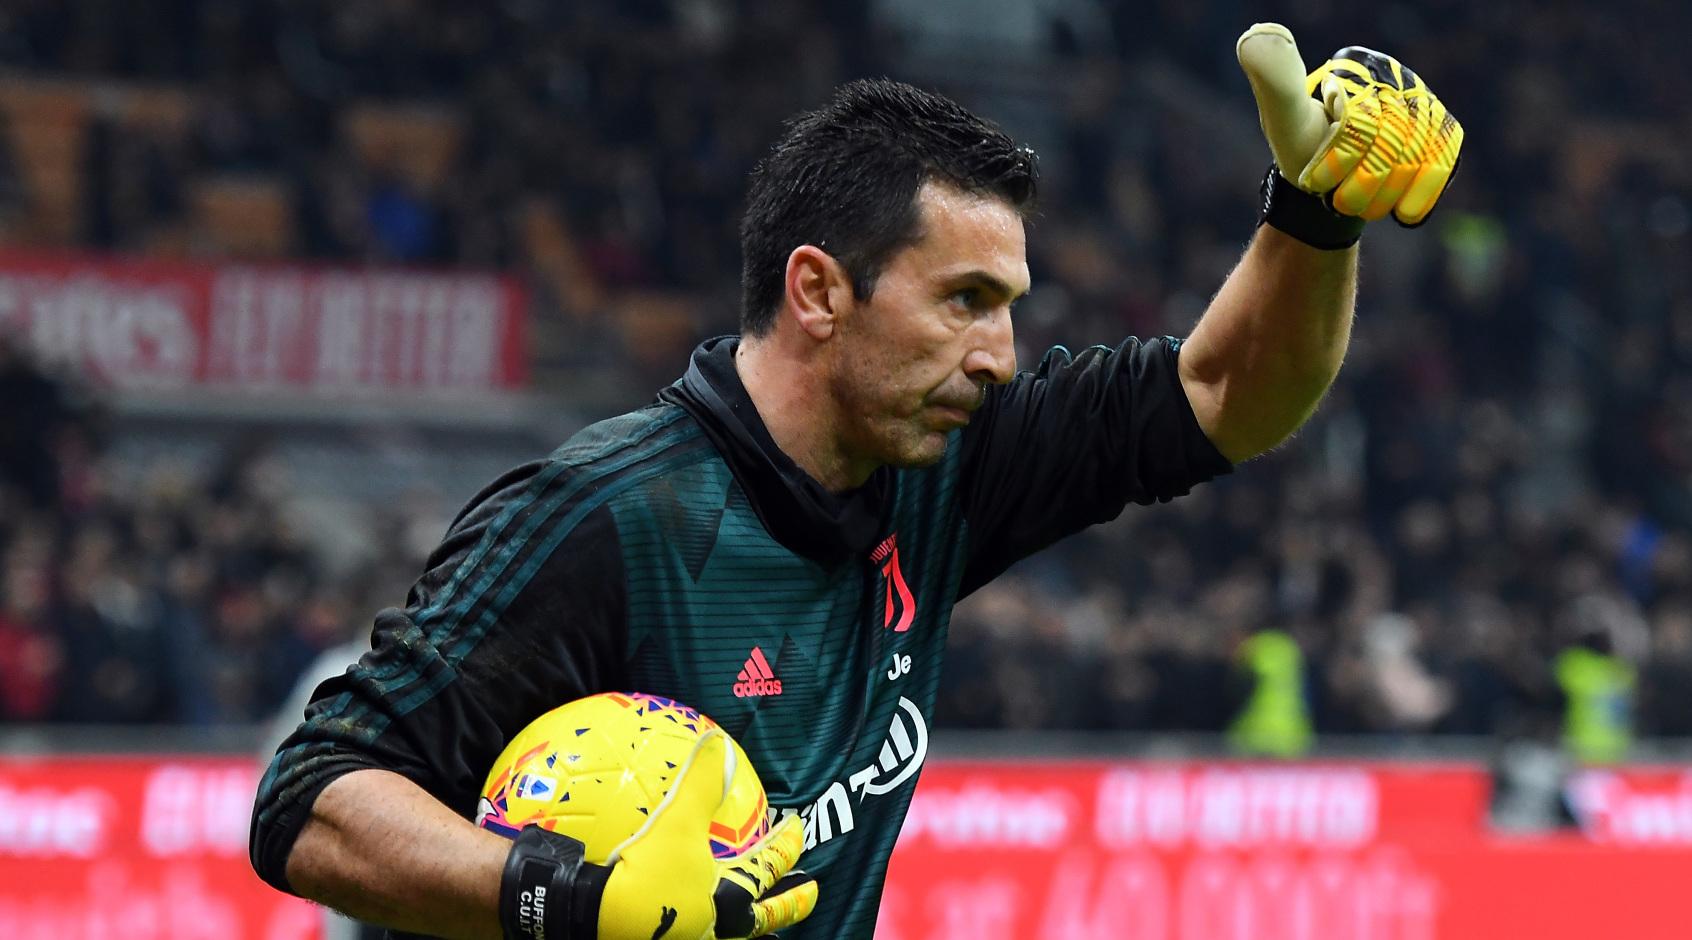 Буффон дисквалифицирован на один матч Серии А за богохульство